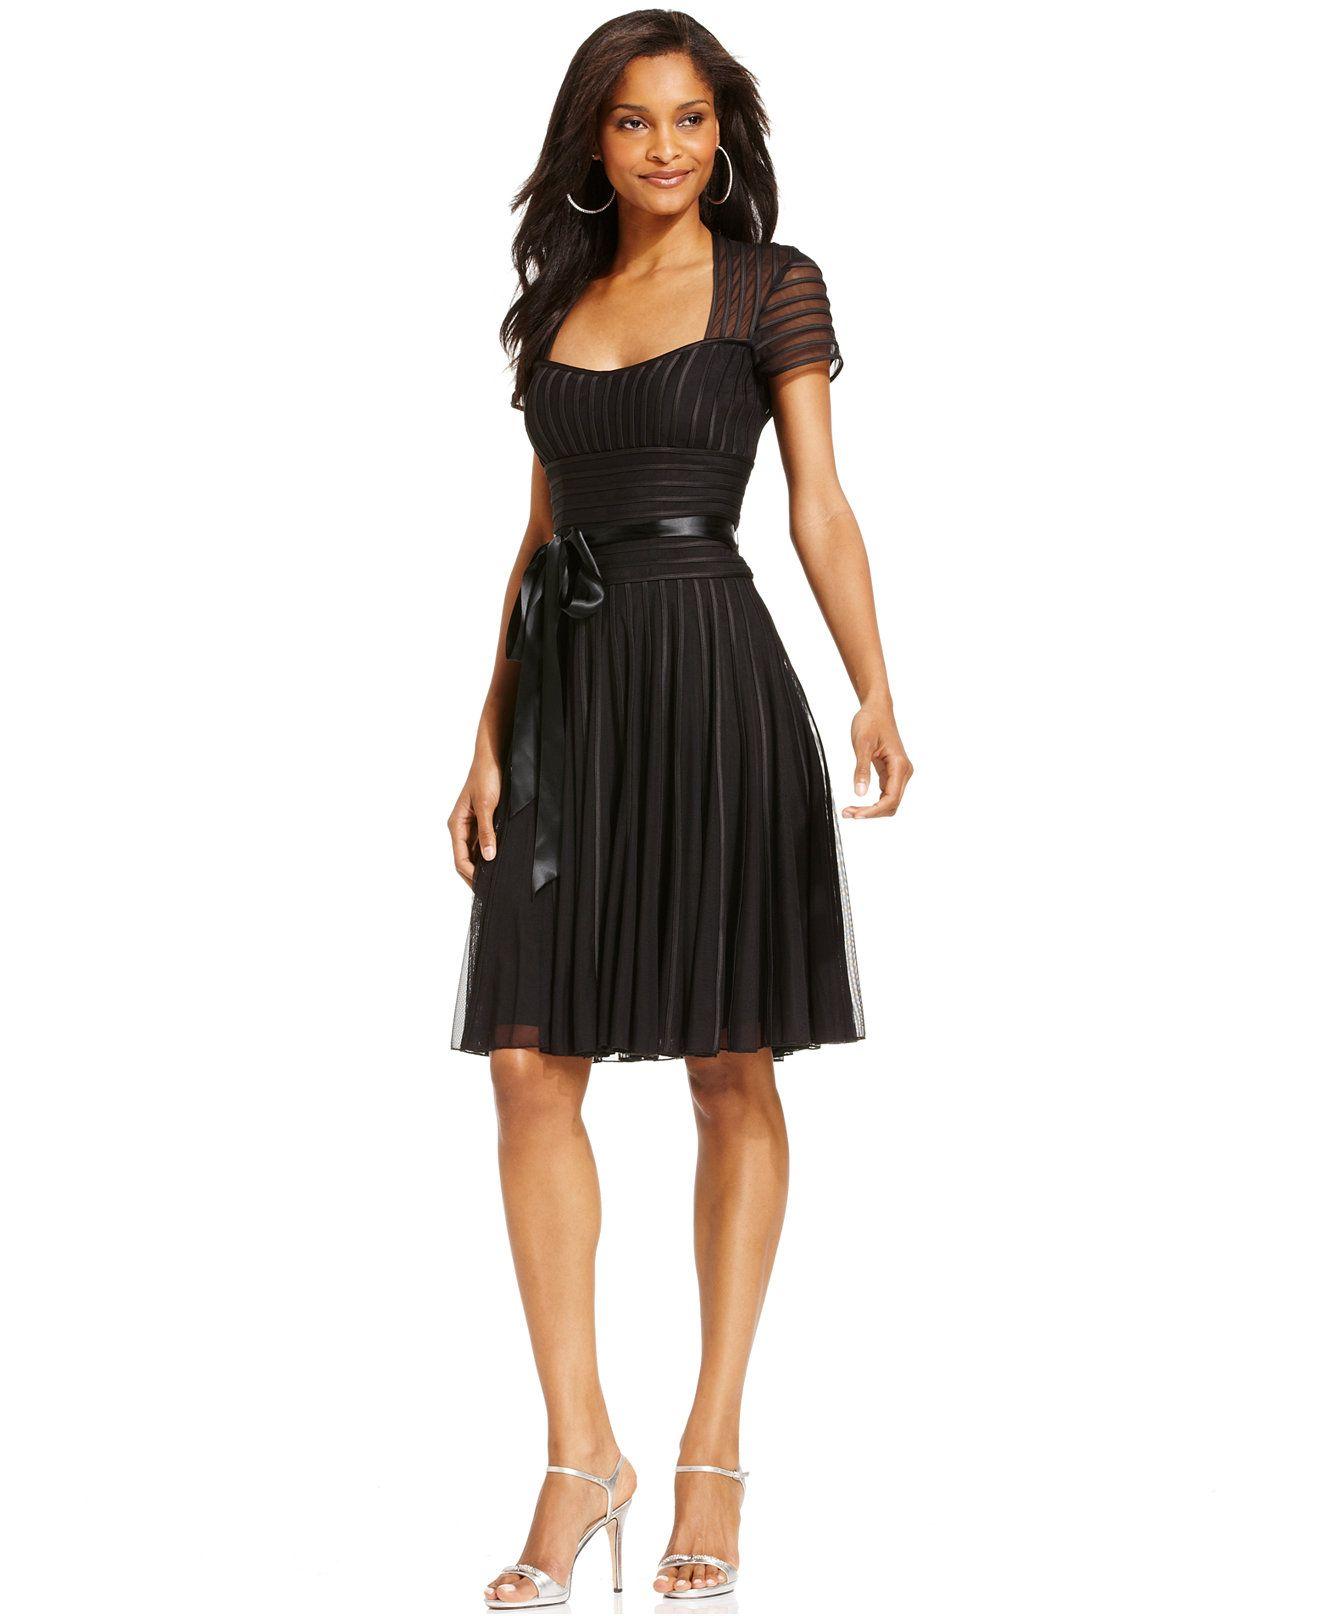 Js collections shortsleeve striped dress dresses women macyus